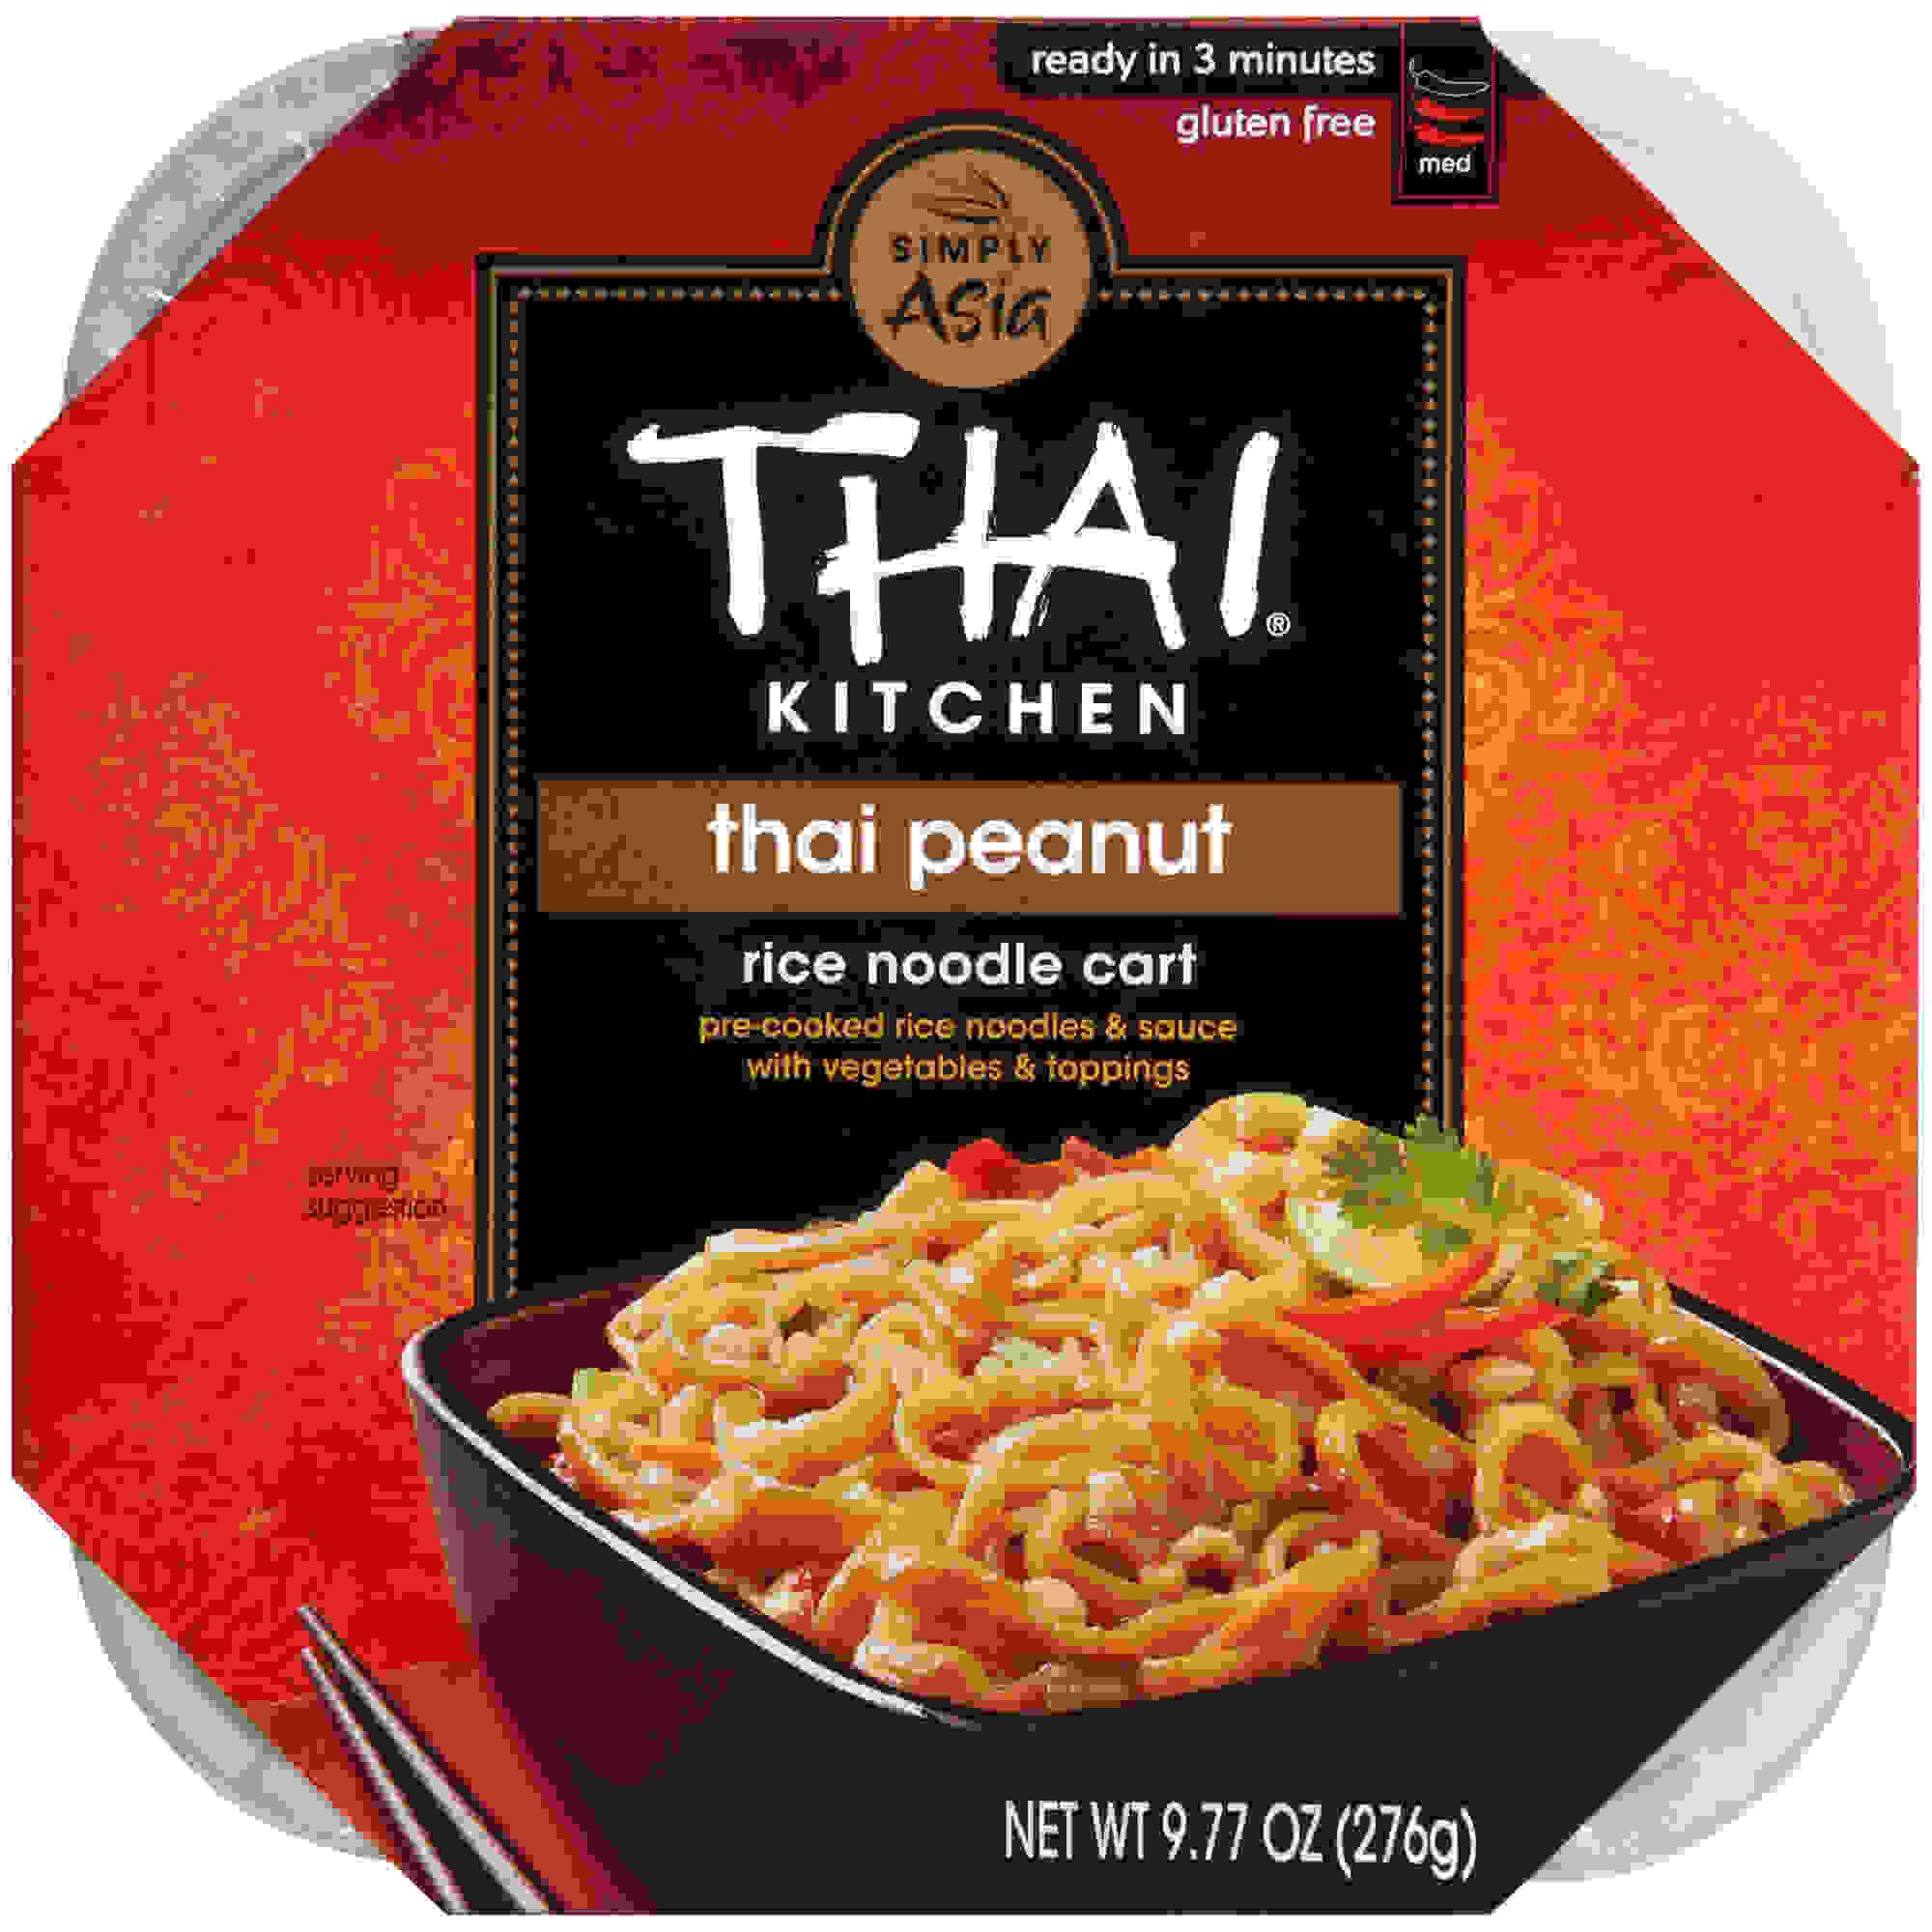 Thai Kitchen Thai Peanut Rice Noodle Gluten Free (6x977 Oz)